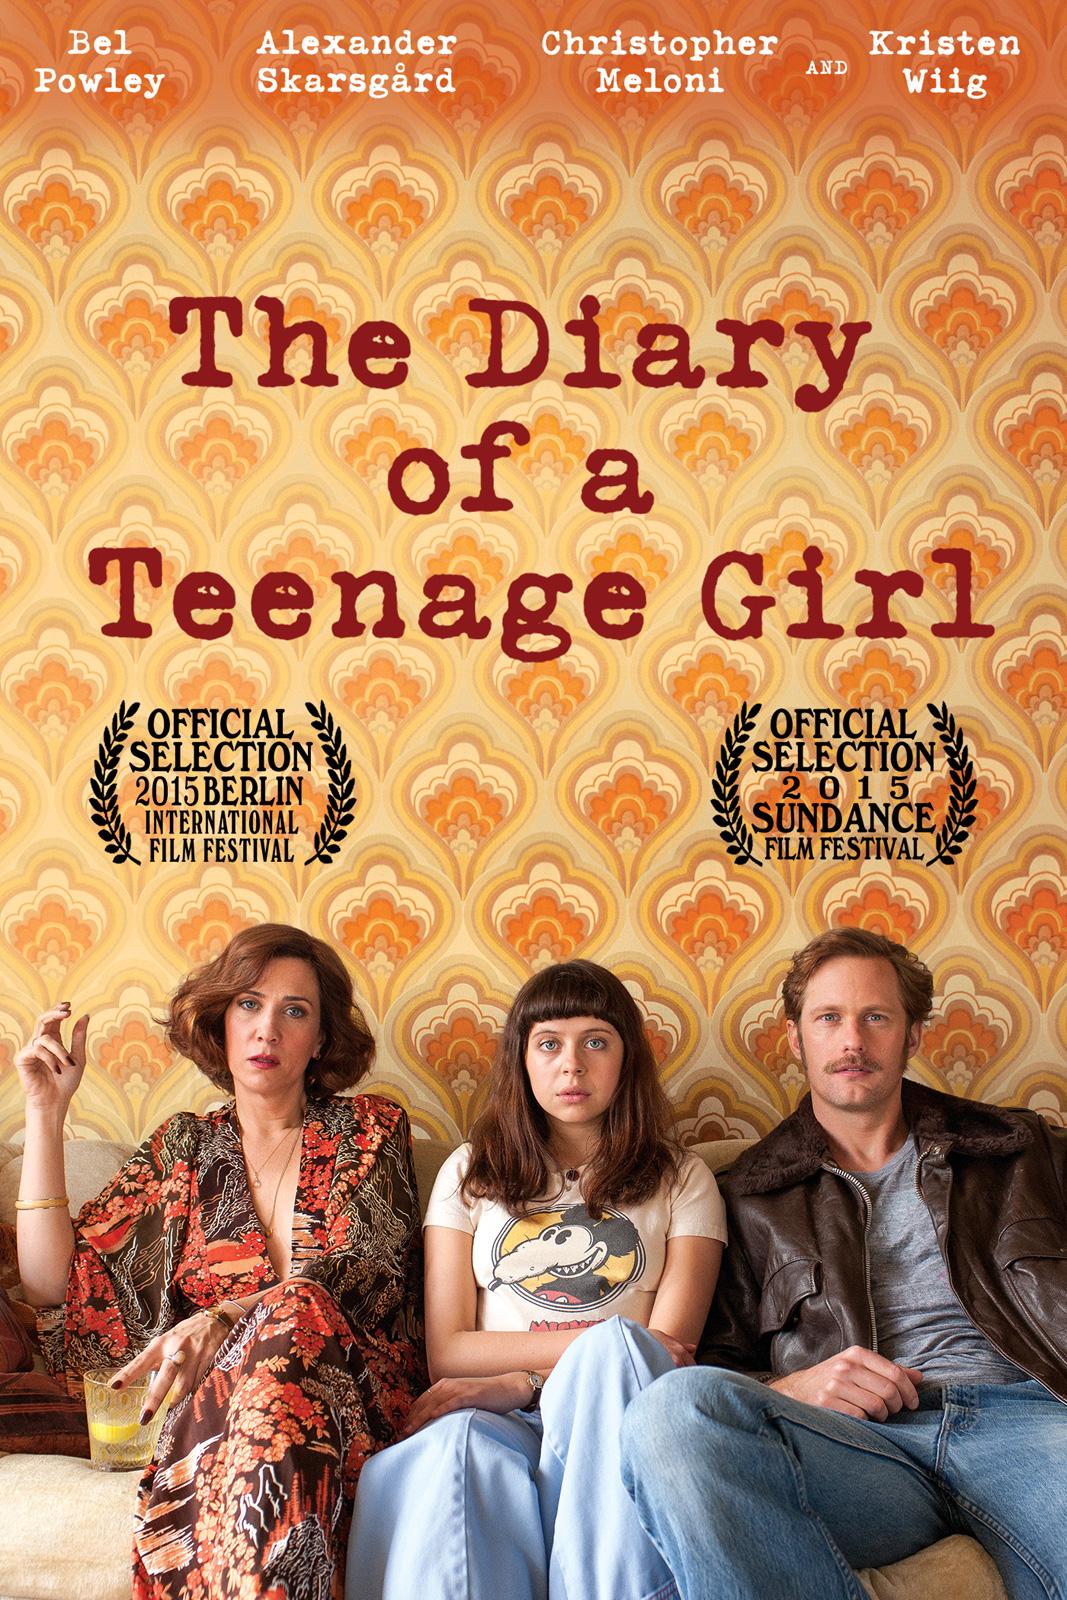 Movies for teenage girls